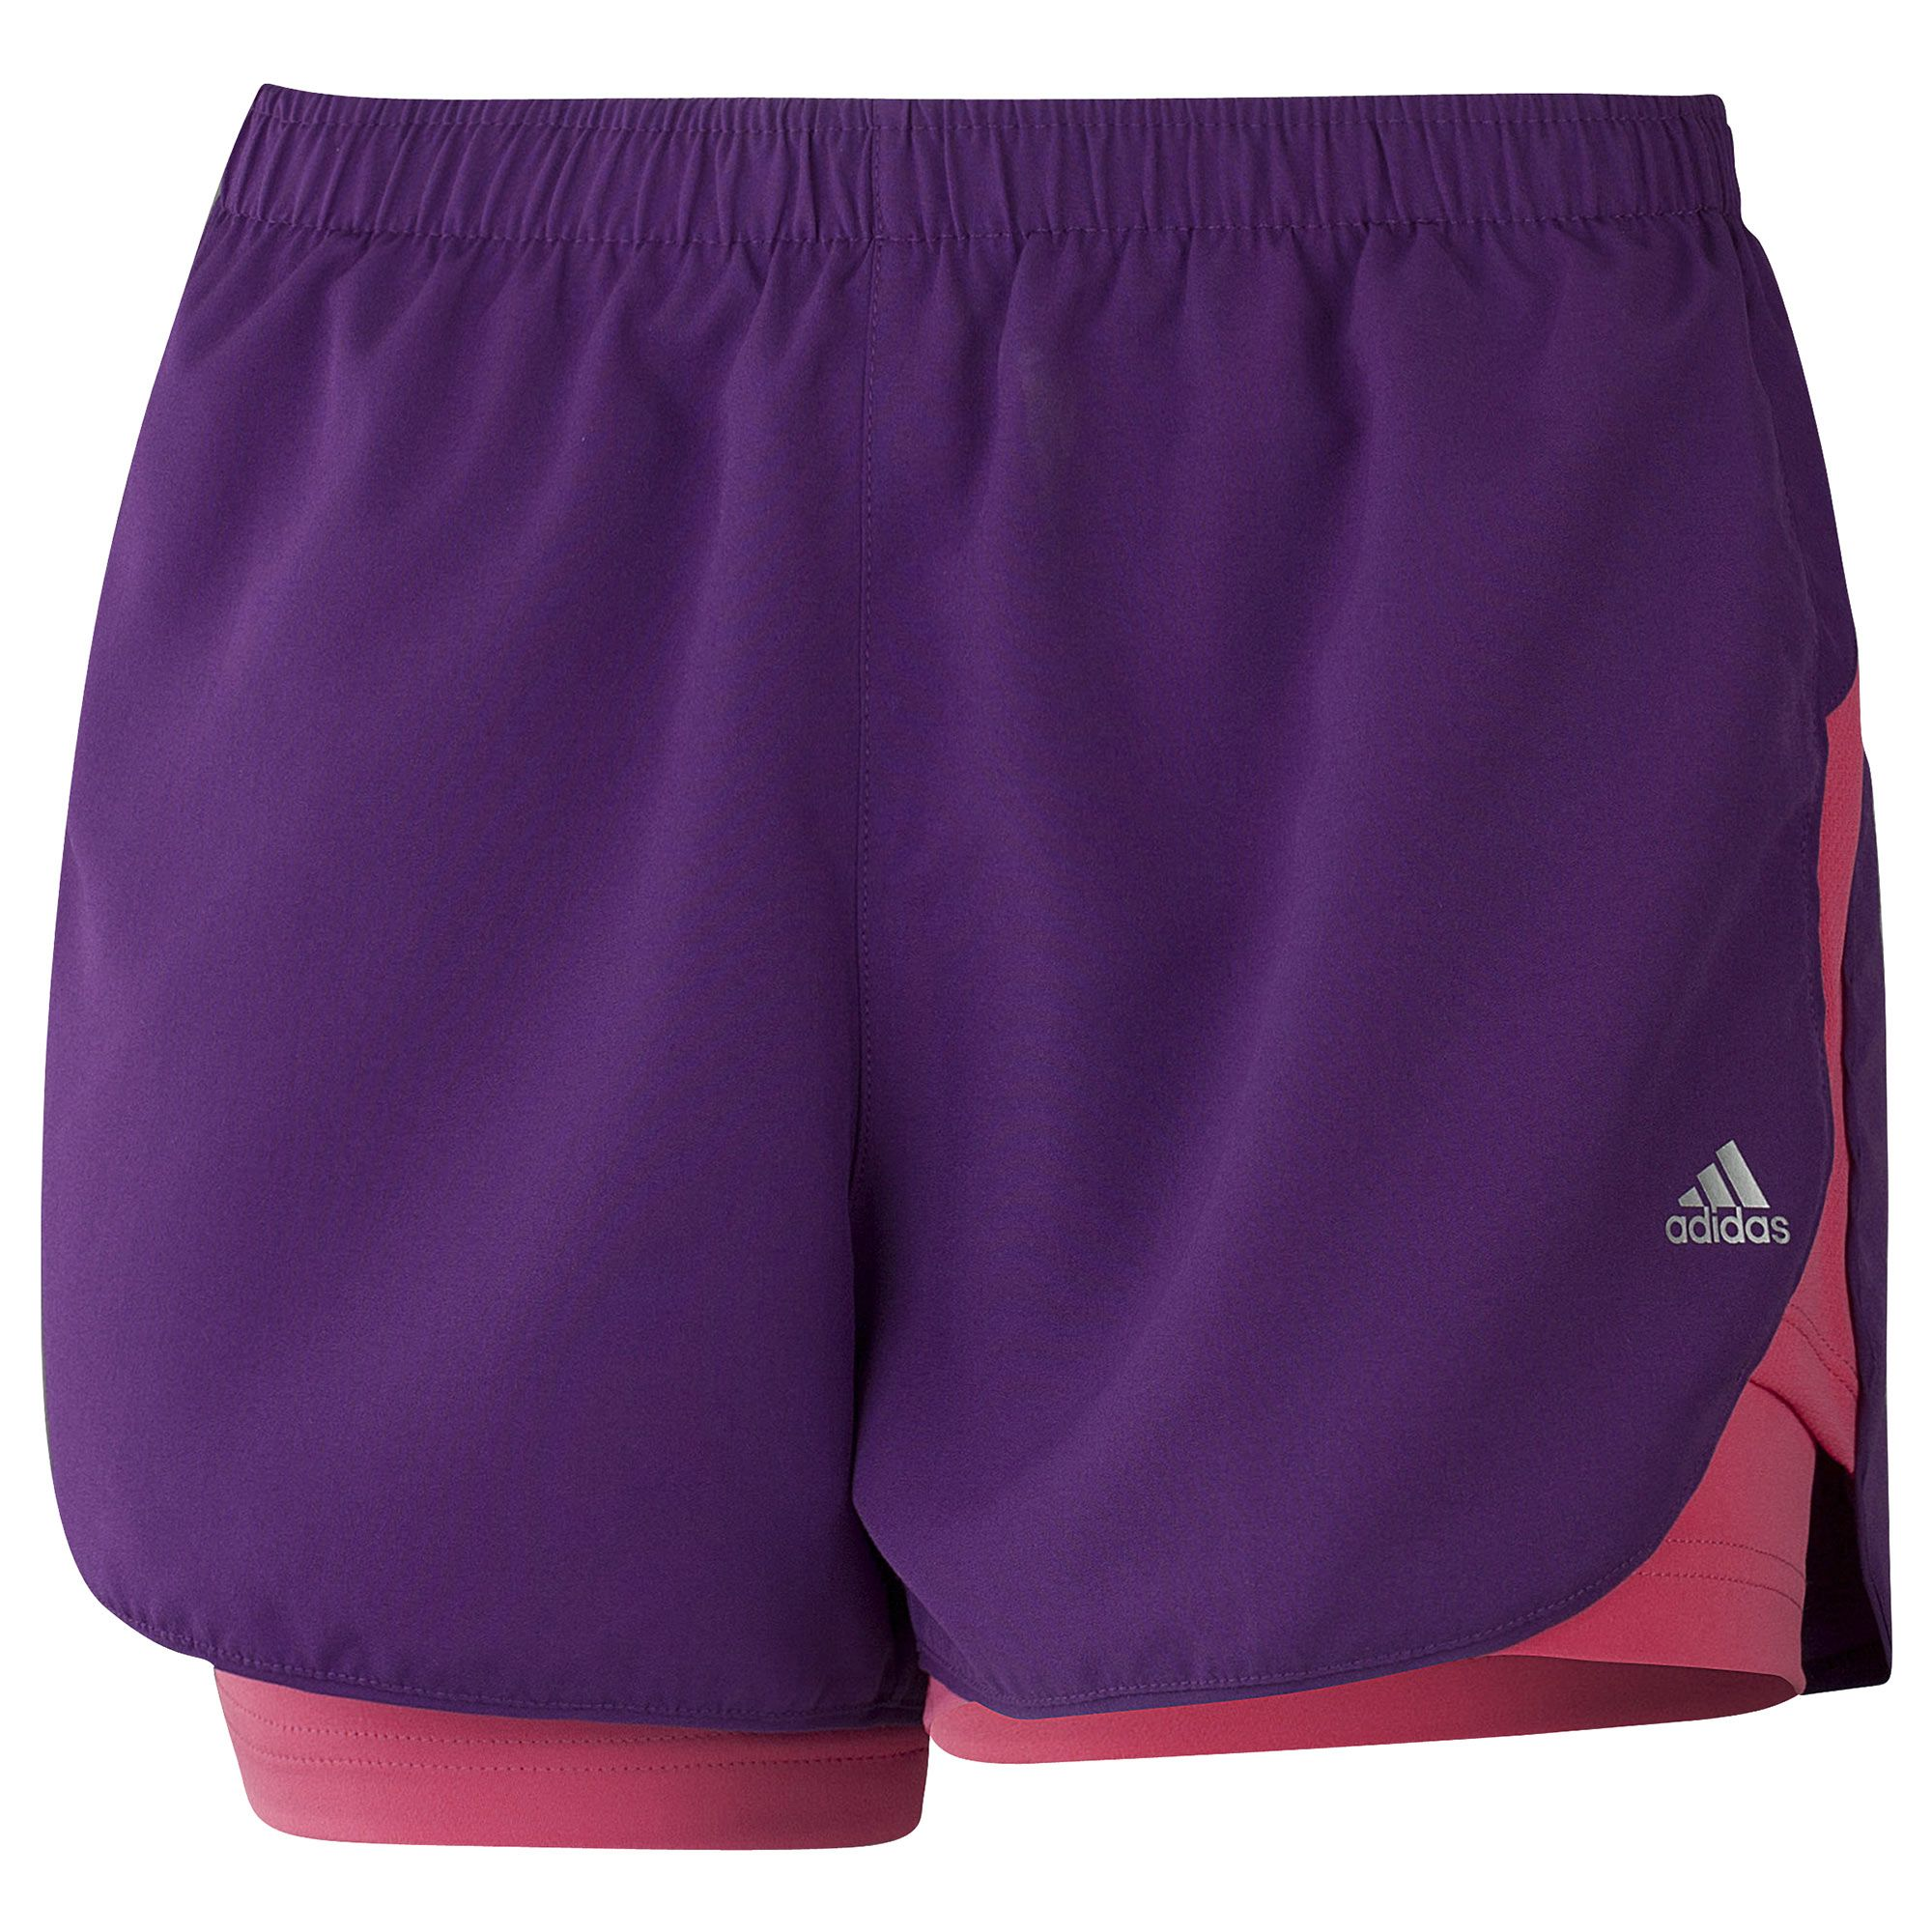 ecfc403af7c6ce Short Duplo Essentials Fun Feminino adidas | adidas Brasil Roupas Simples,  Sapatos, Shorts Adidas